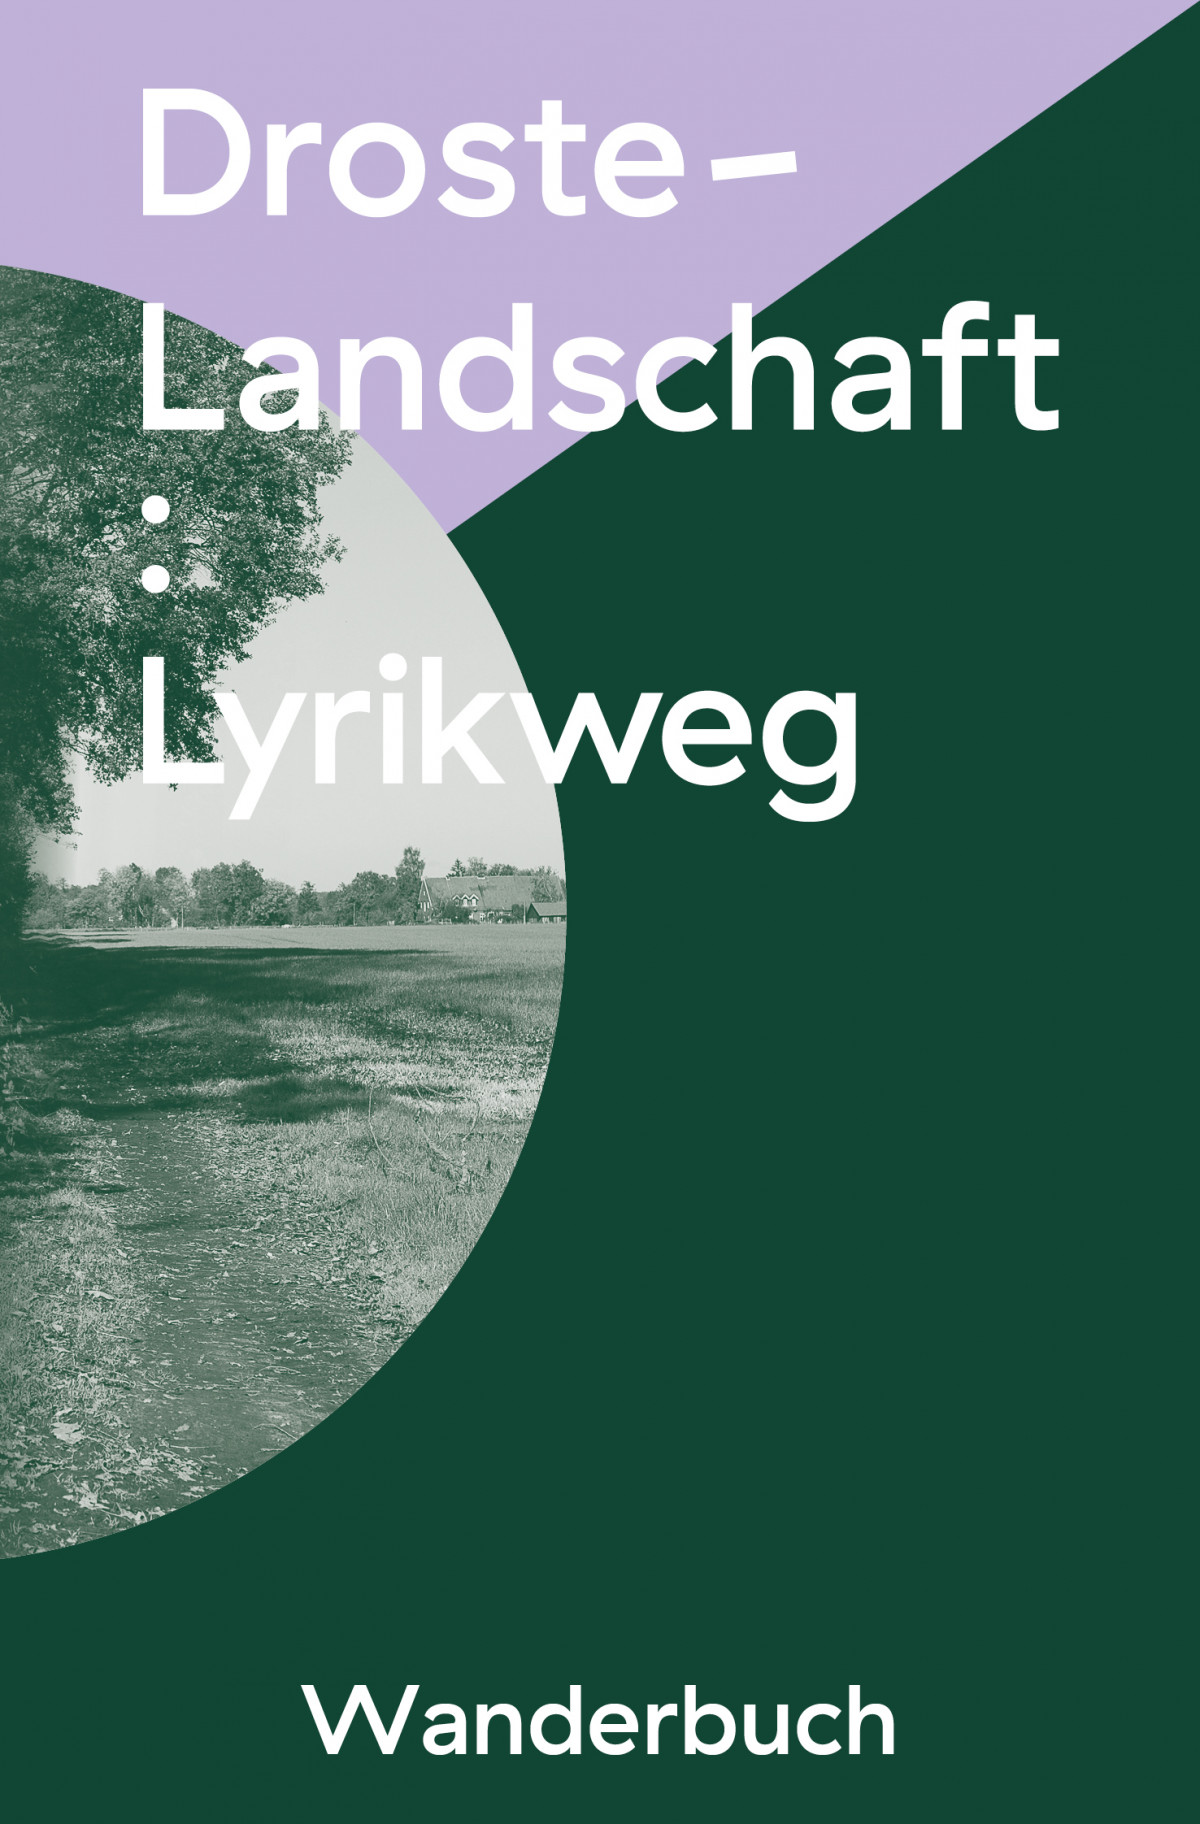 Cover of the hiking book for *Droste-Landschaft : Lyrikweg*